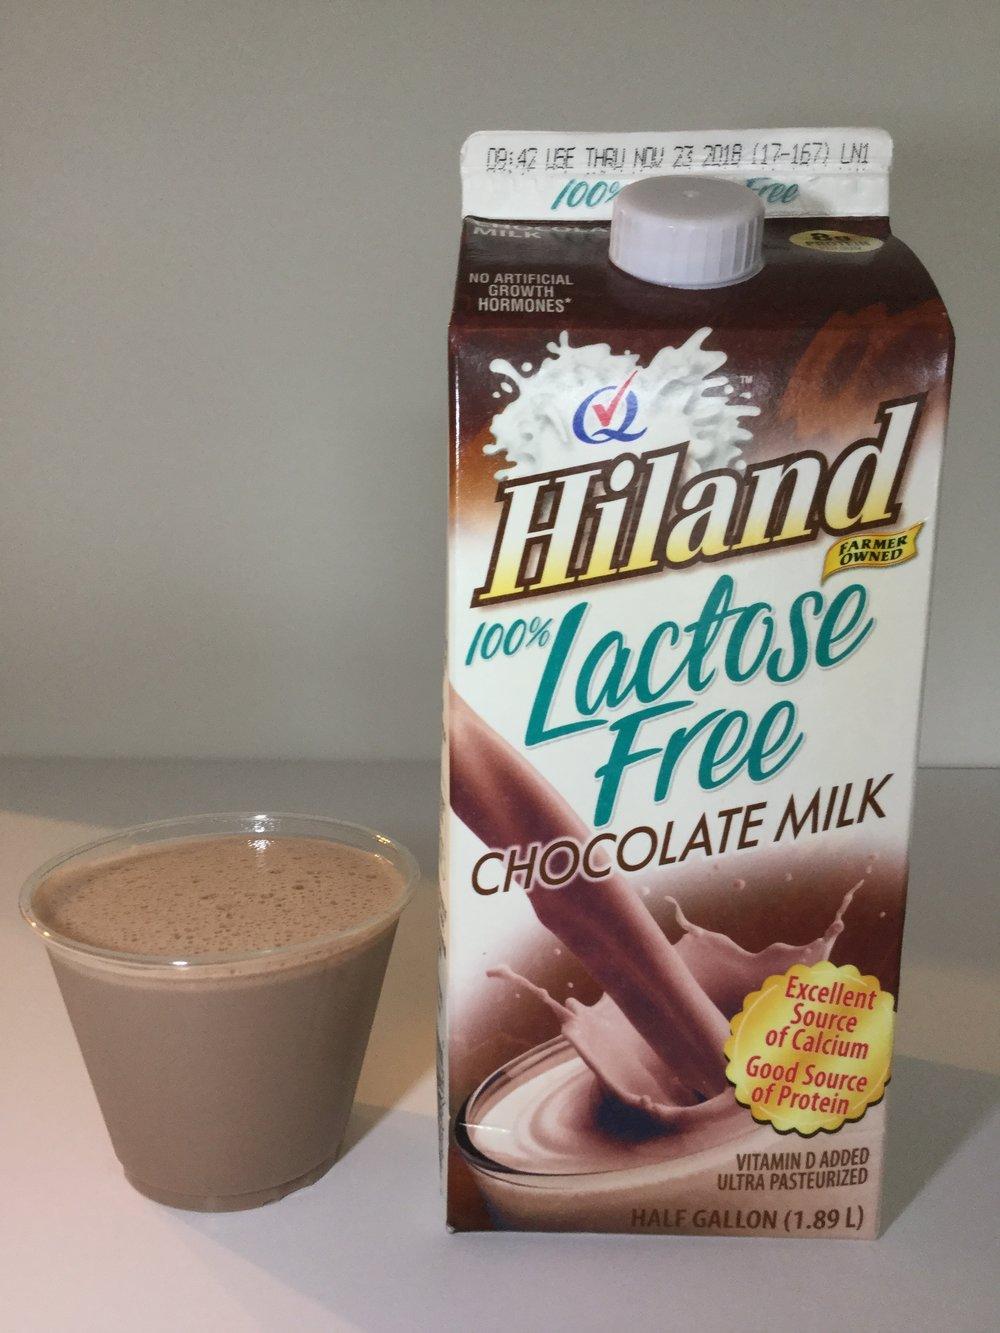 Hiland Lactose Free Chocolate Milk Cup